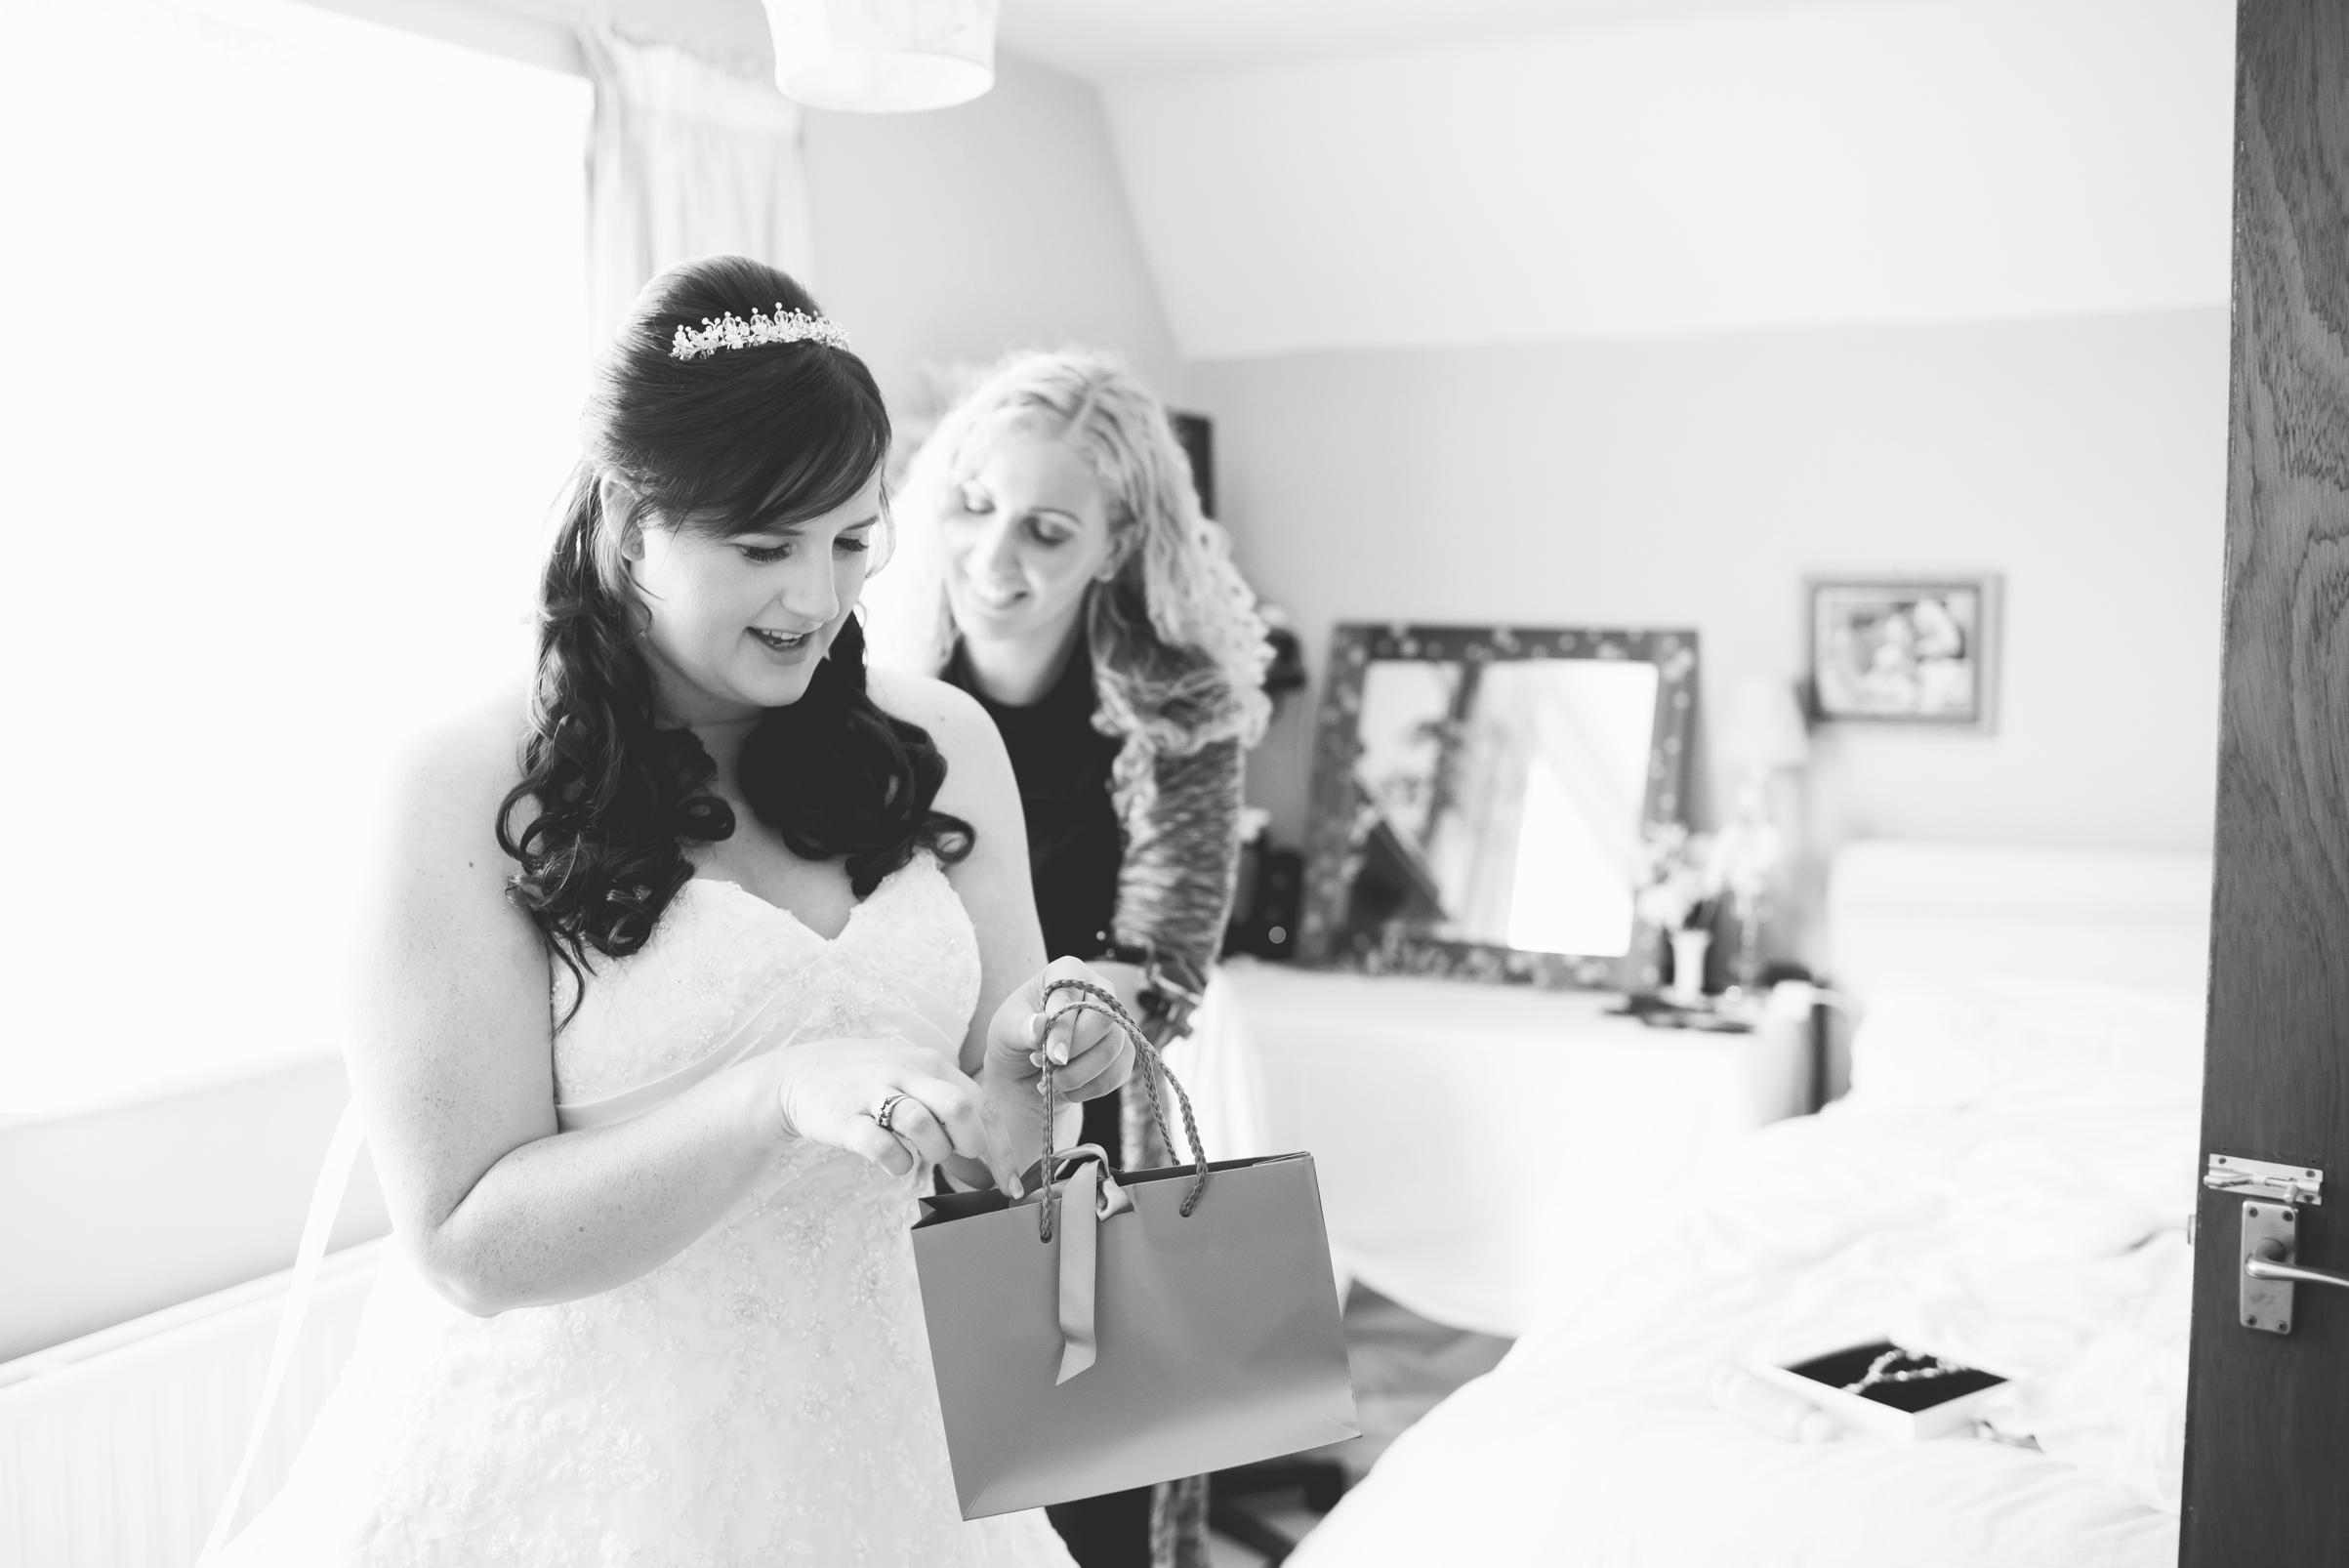 The+Fairlawns+wedding+Aldridge+StLukes+Church-67.jpg